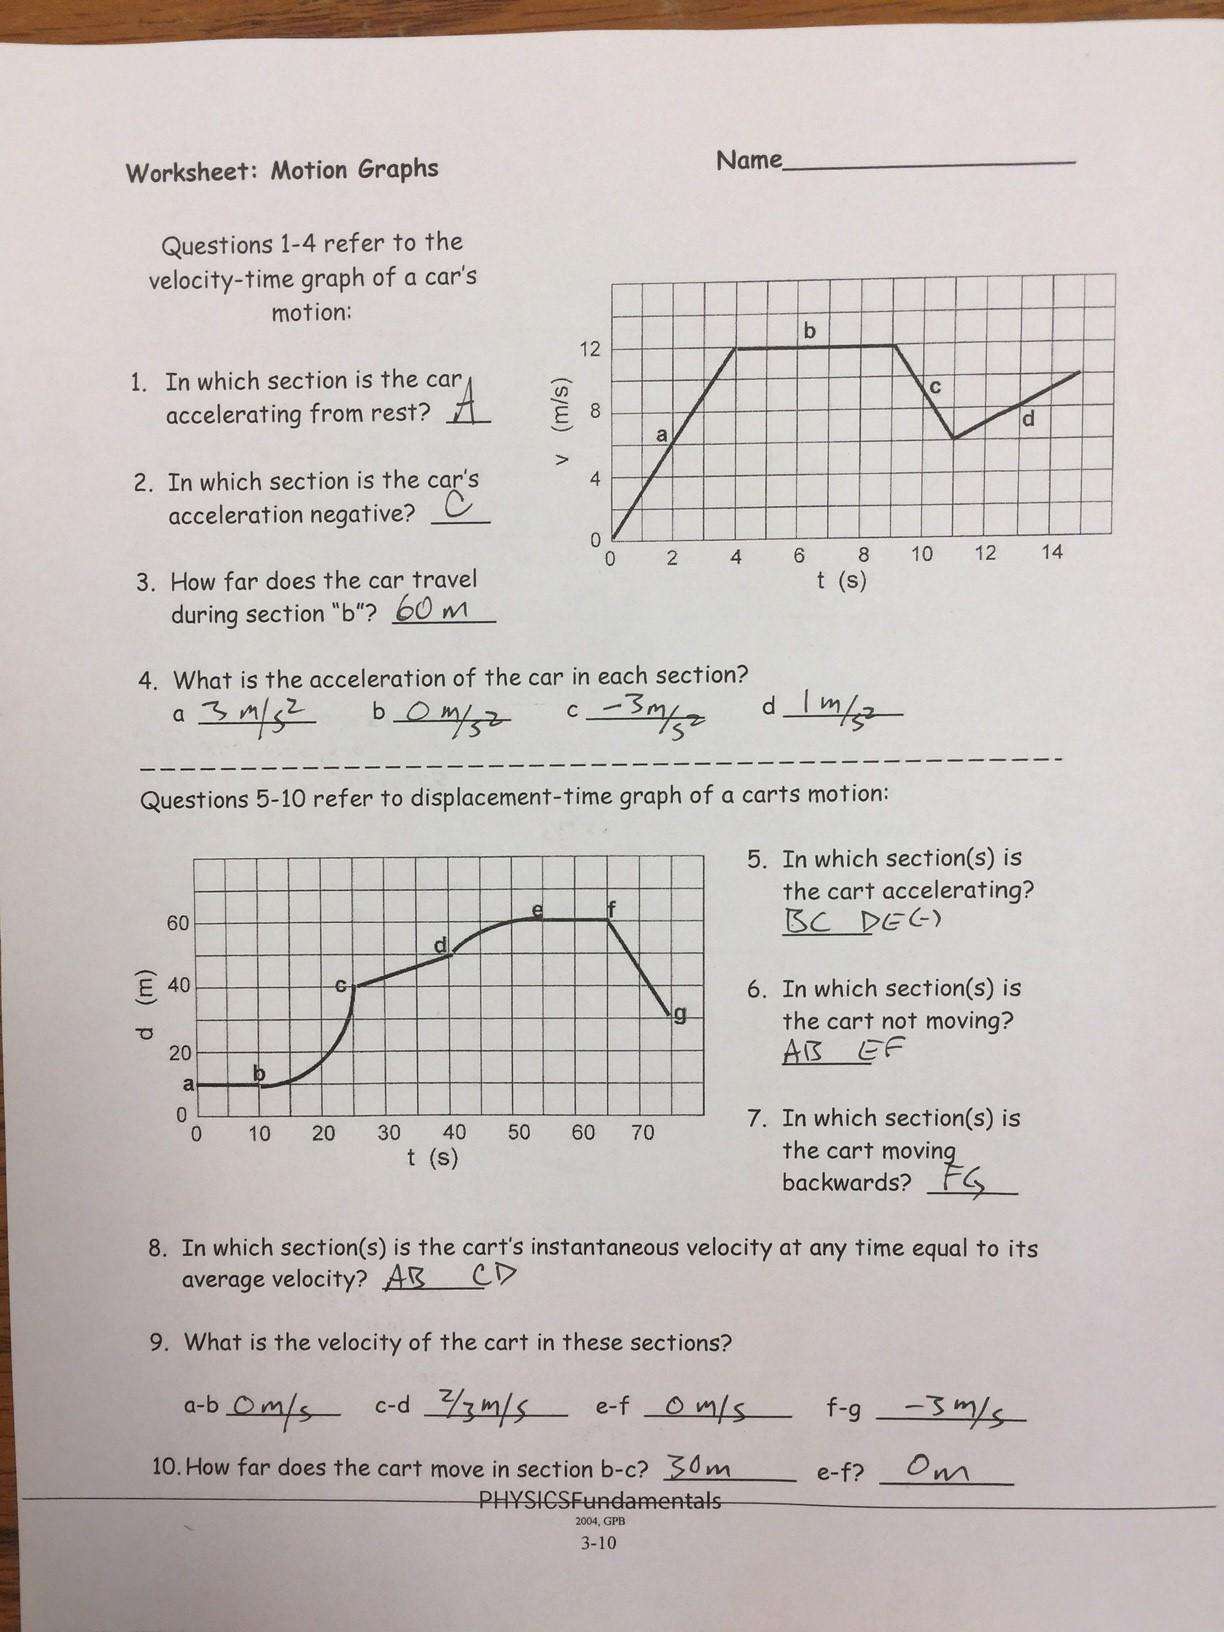 Motion Graphs Worksheet Answers Motion Graphs Worksheet